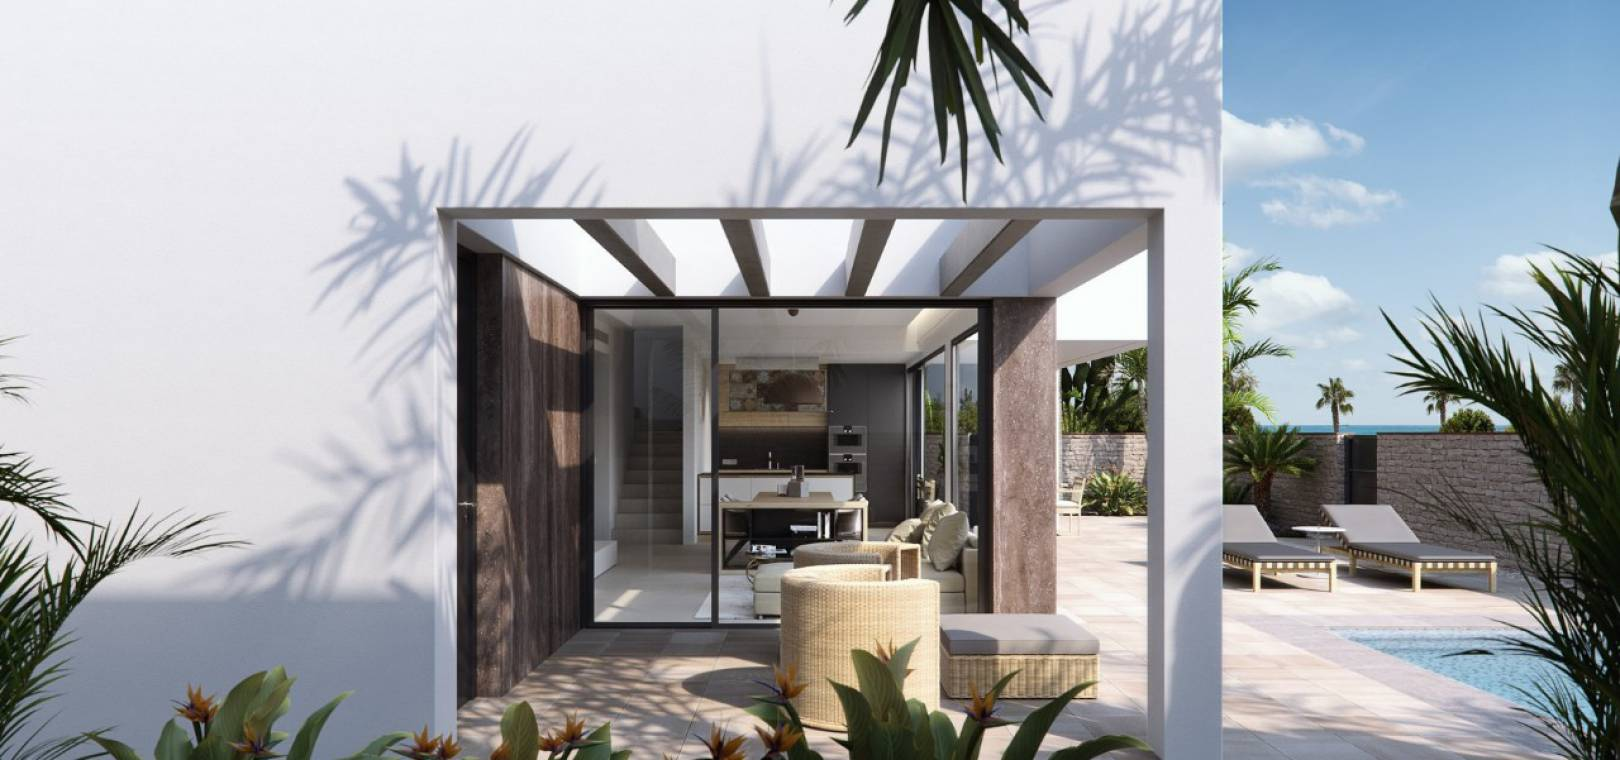 Torre_de_la_Horadada_New_Build_Luxury_Houses_For_Sale_nsp256_5